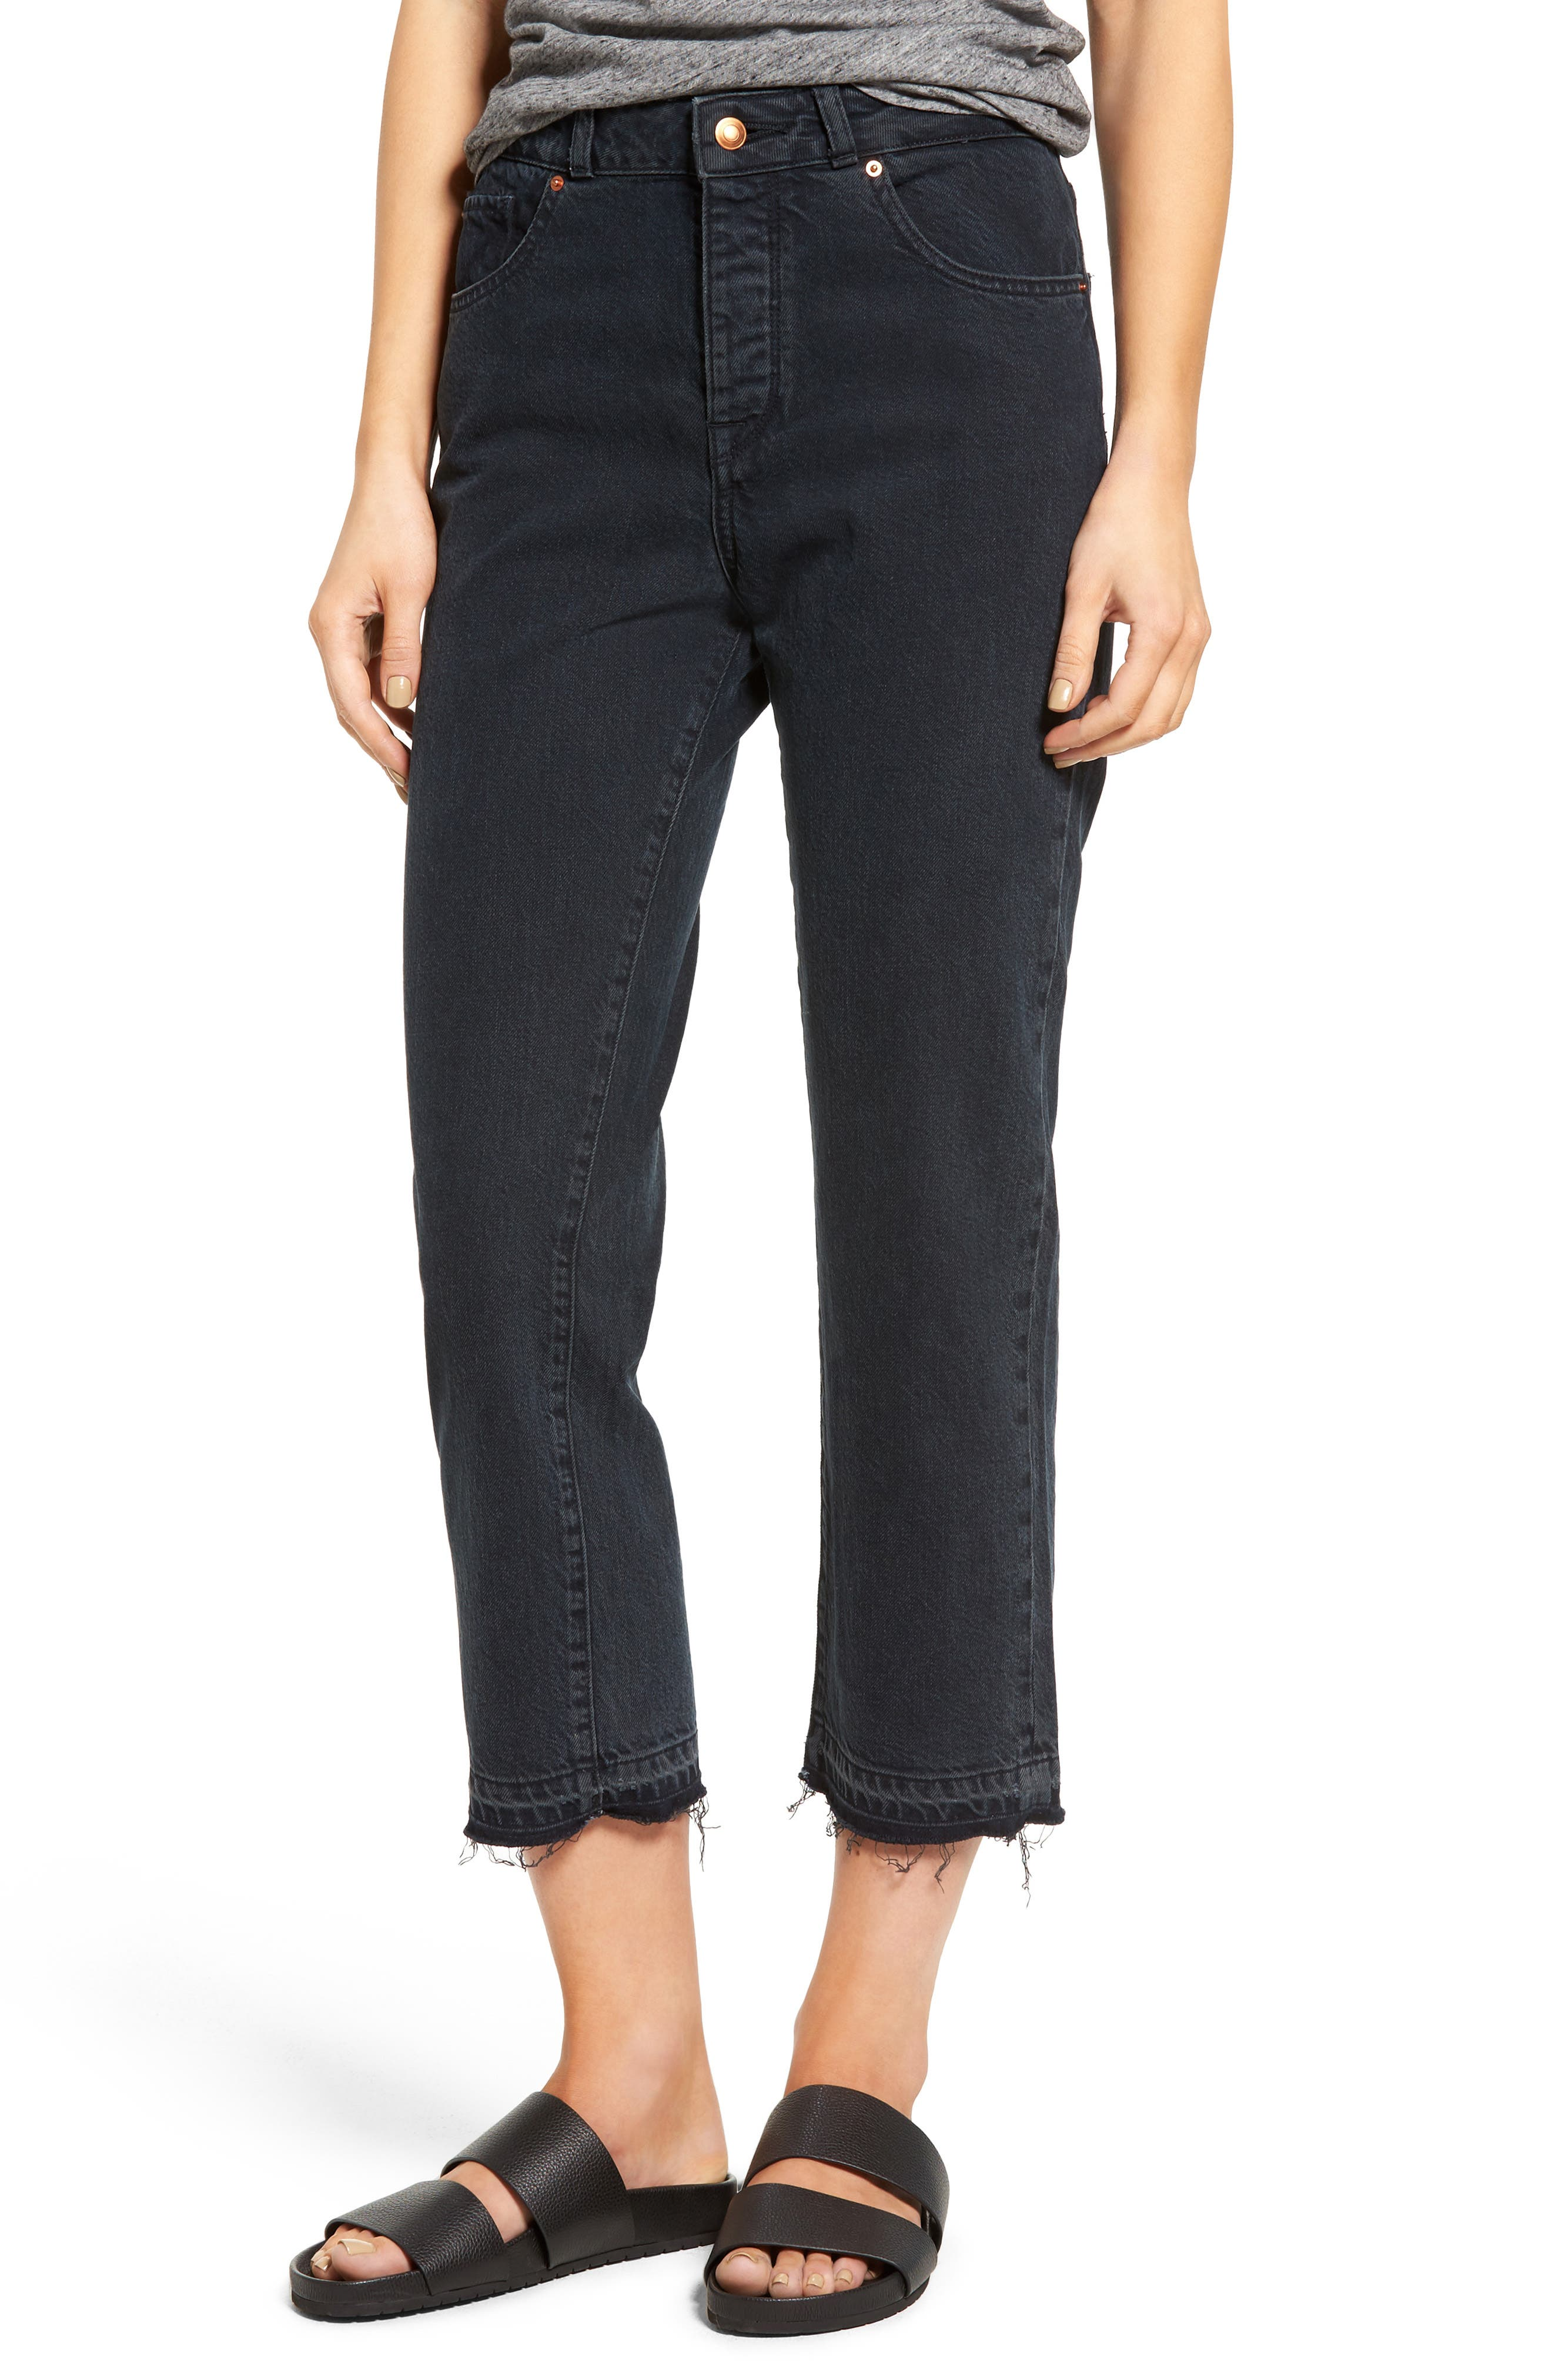 Patti High Rise Straight Leg Jeans,                             Main thumbnail 1, color,                             002